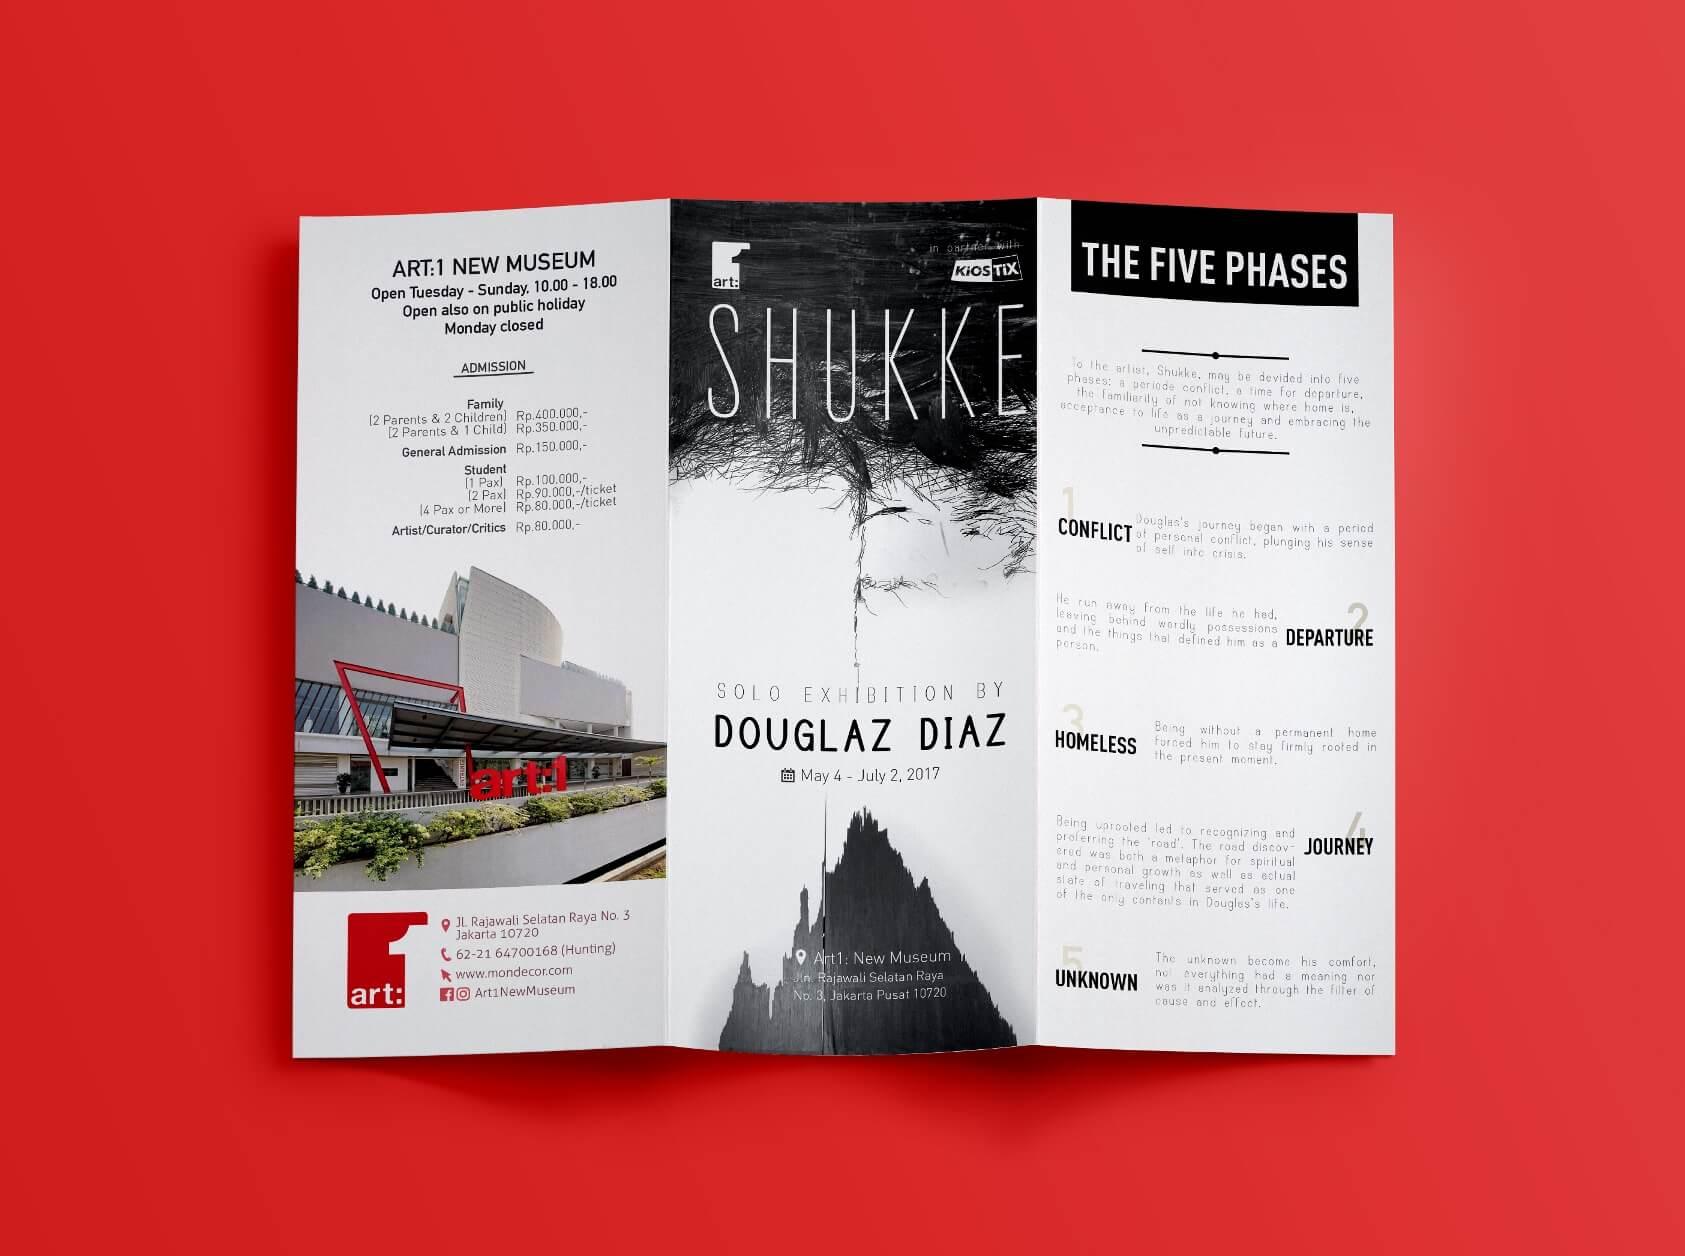 Art:1 New Museum - Shukke Exhibition - 2017 - PORTO PRITA